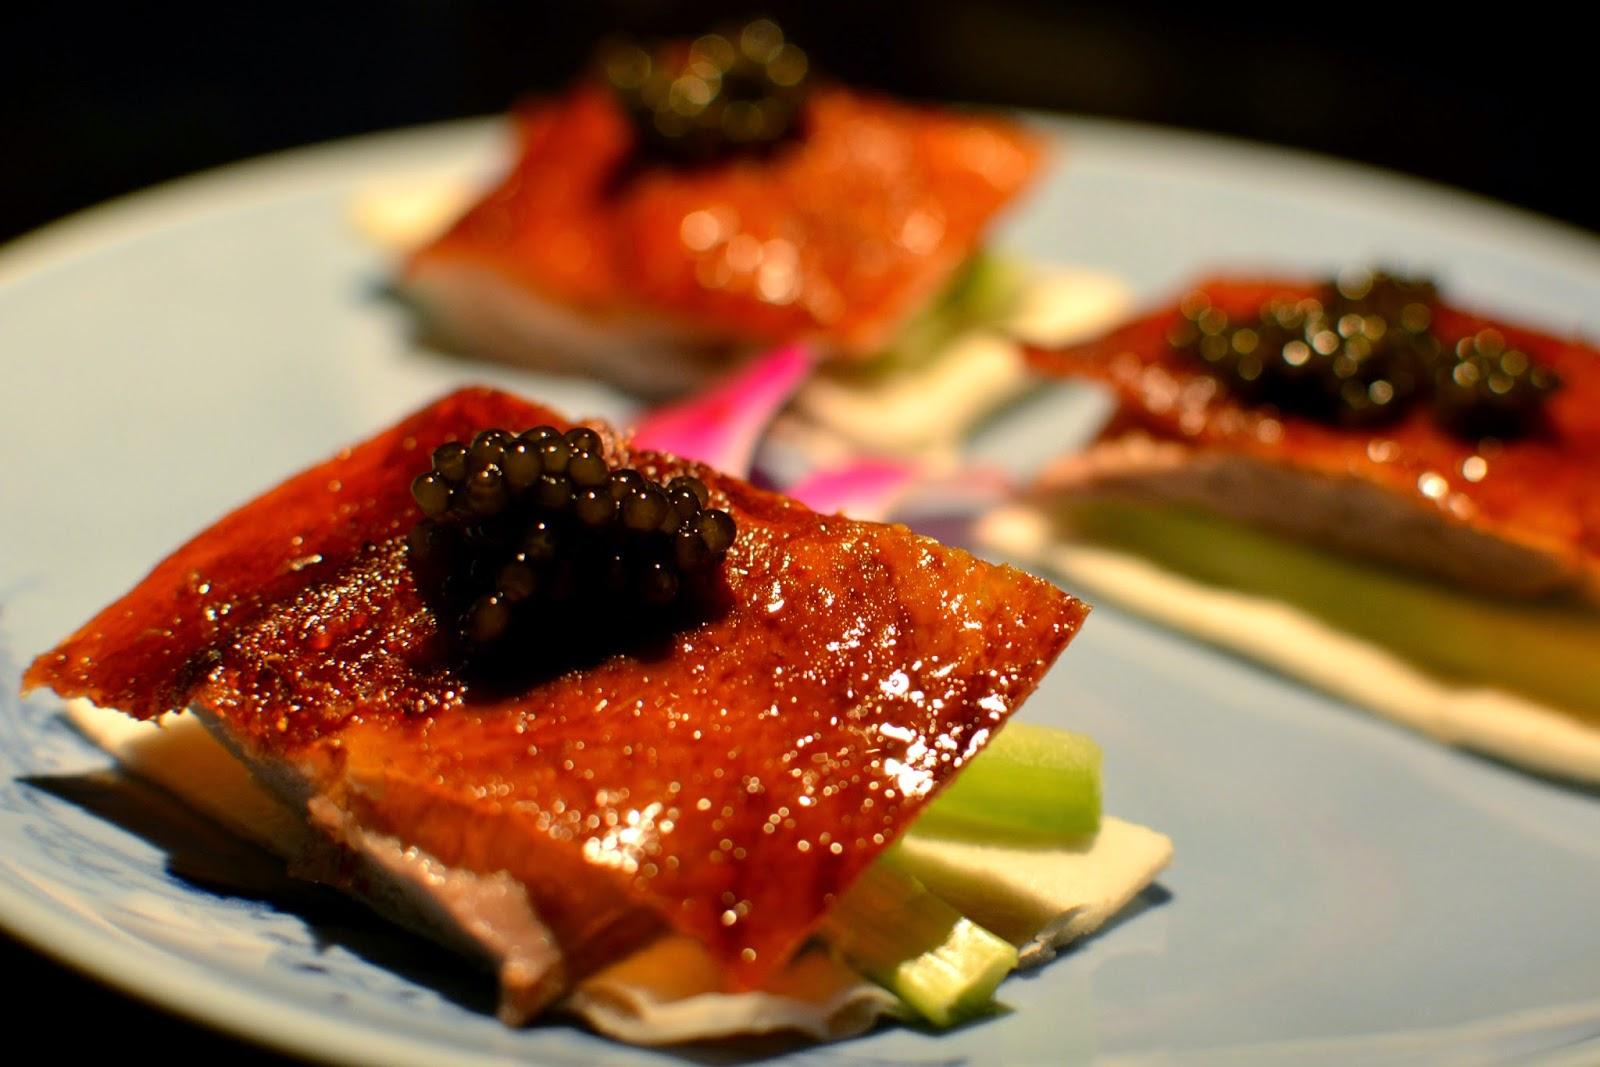 Hakkasan Peking duck with special reserve 'Qiandao' caviar